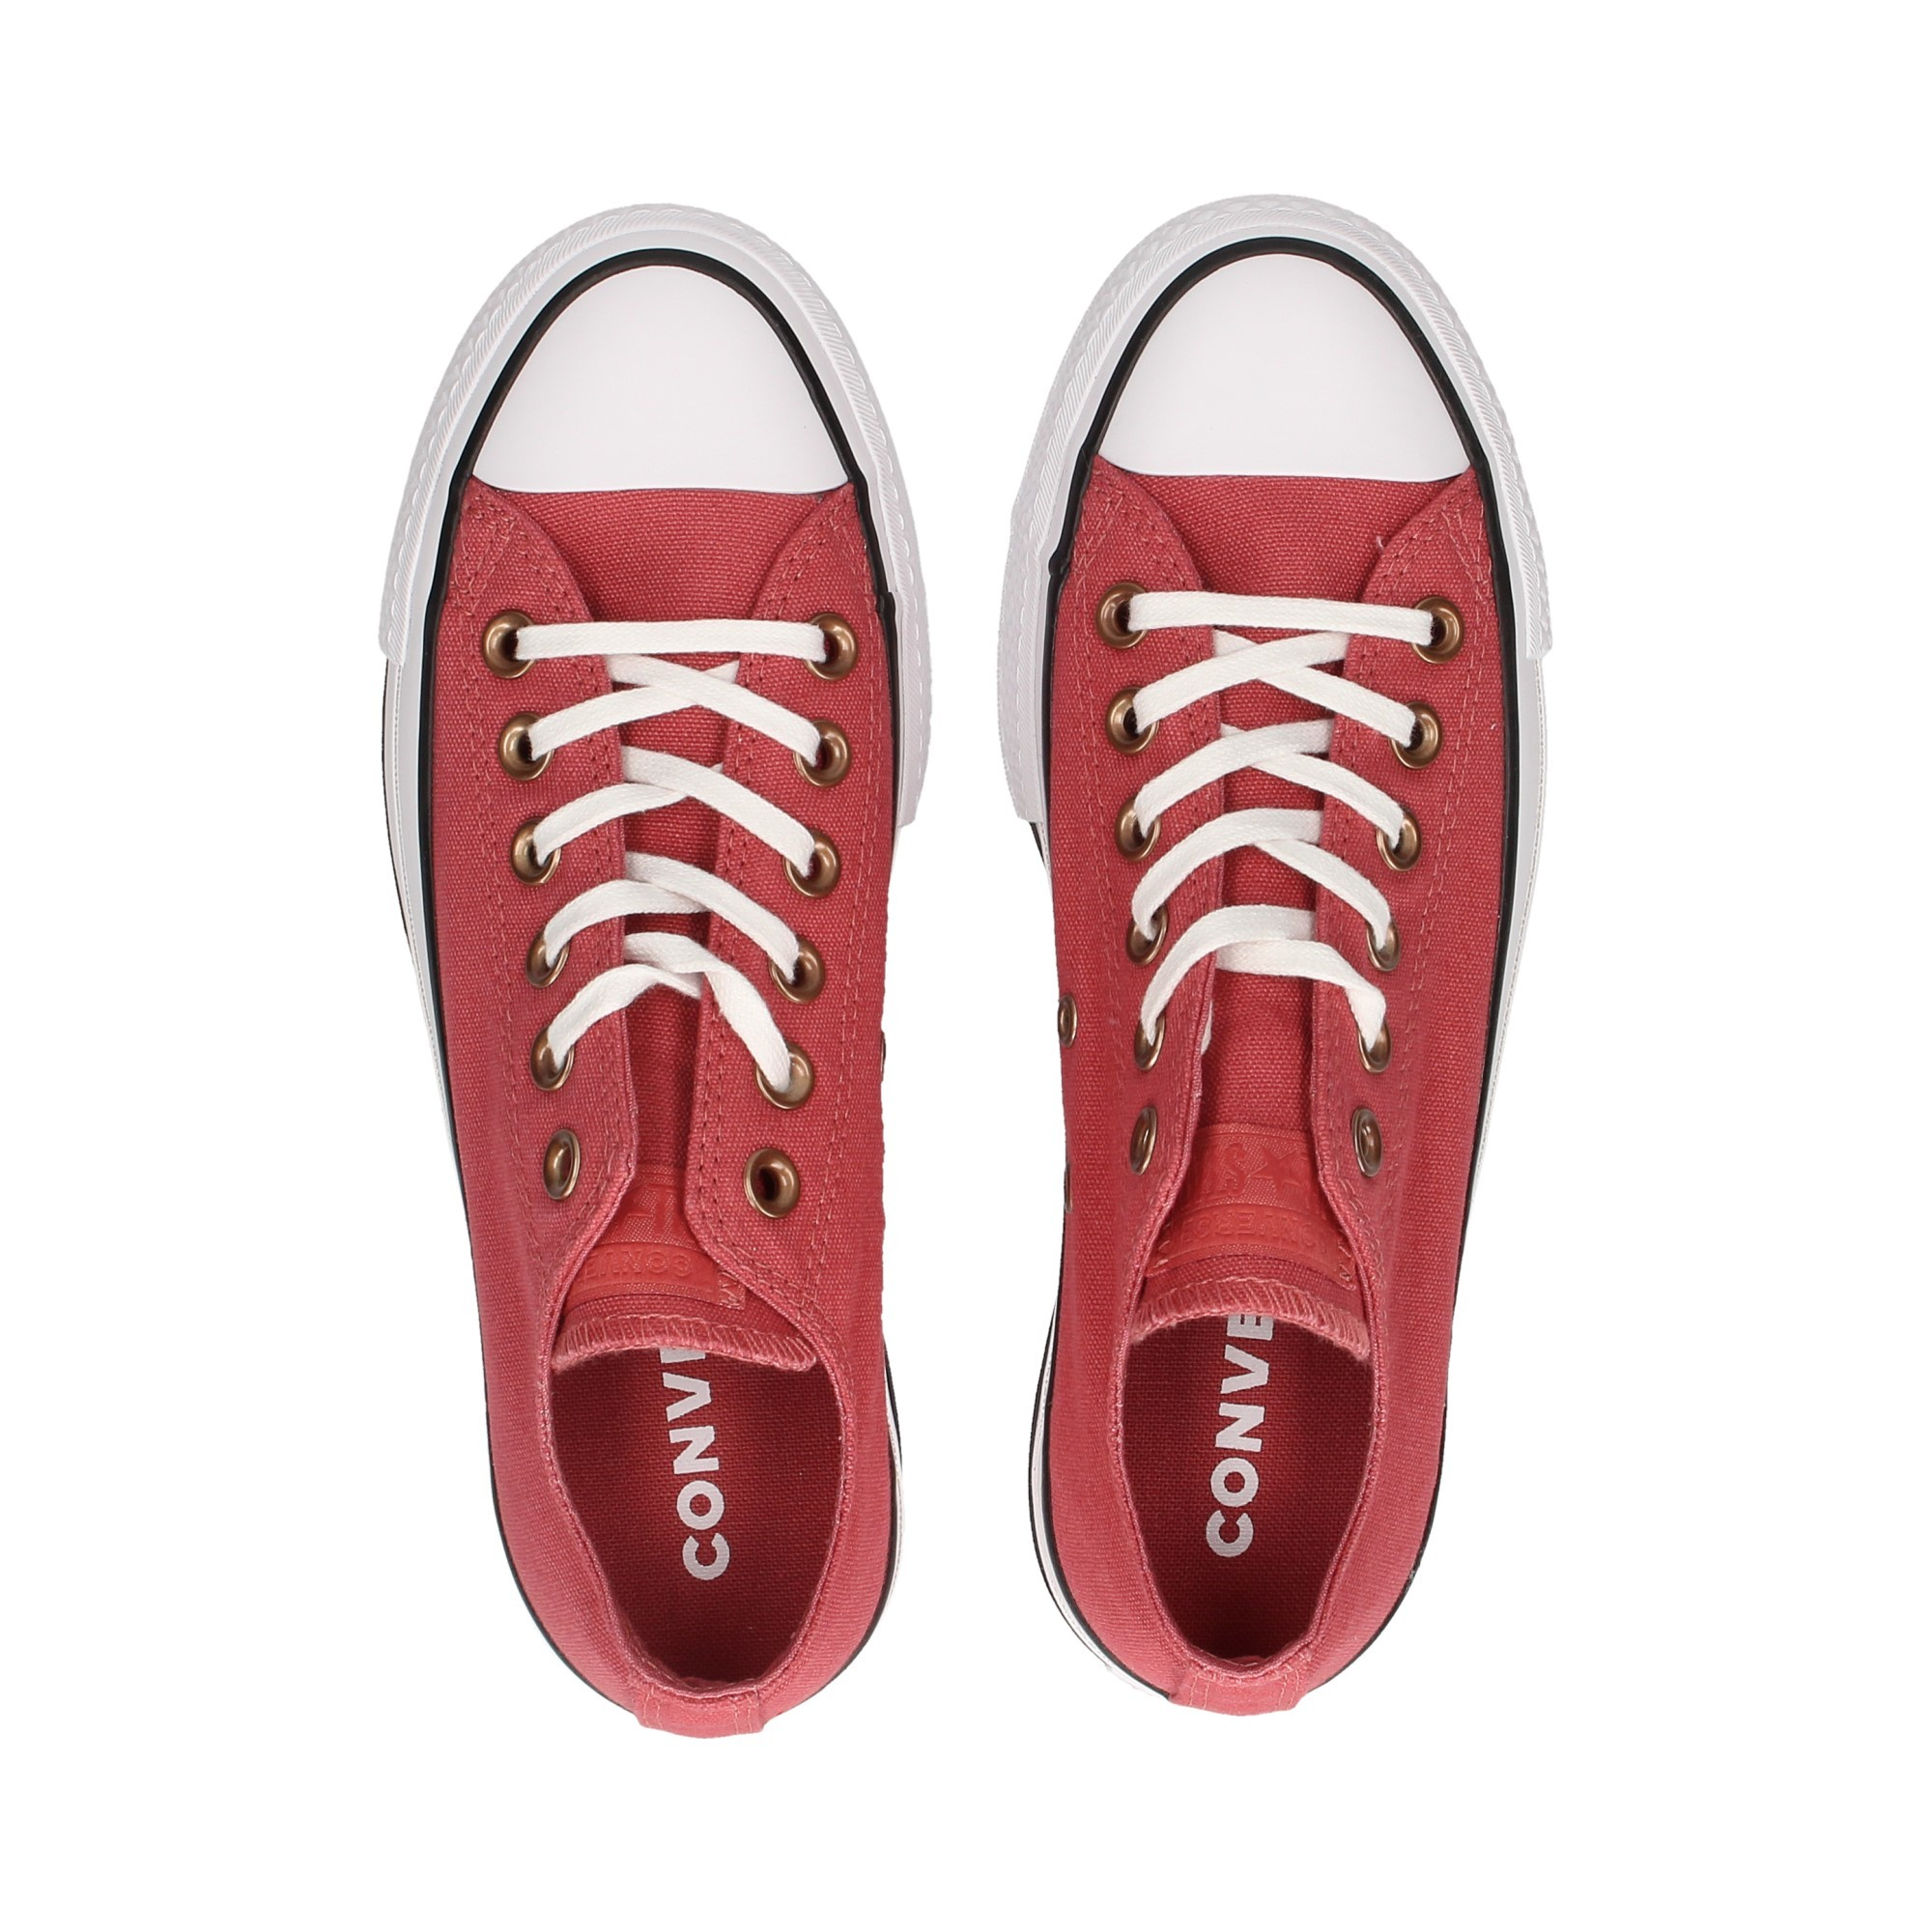 CONVERSE Women's Sneakers 564996C LIGHT REDWOODW